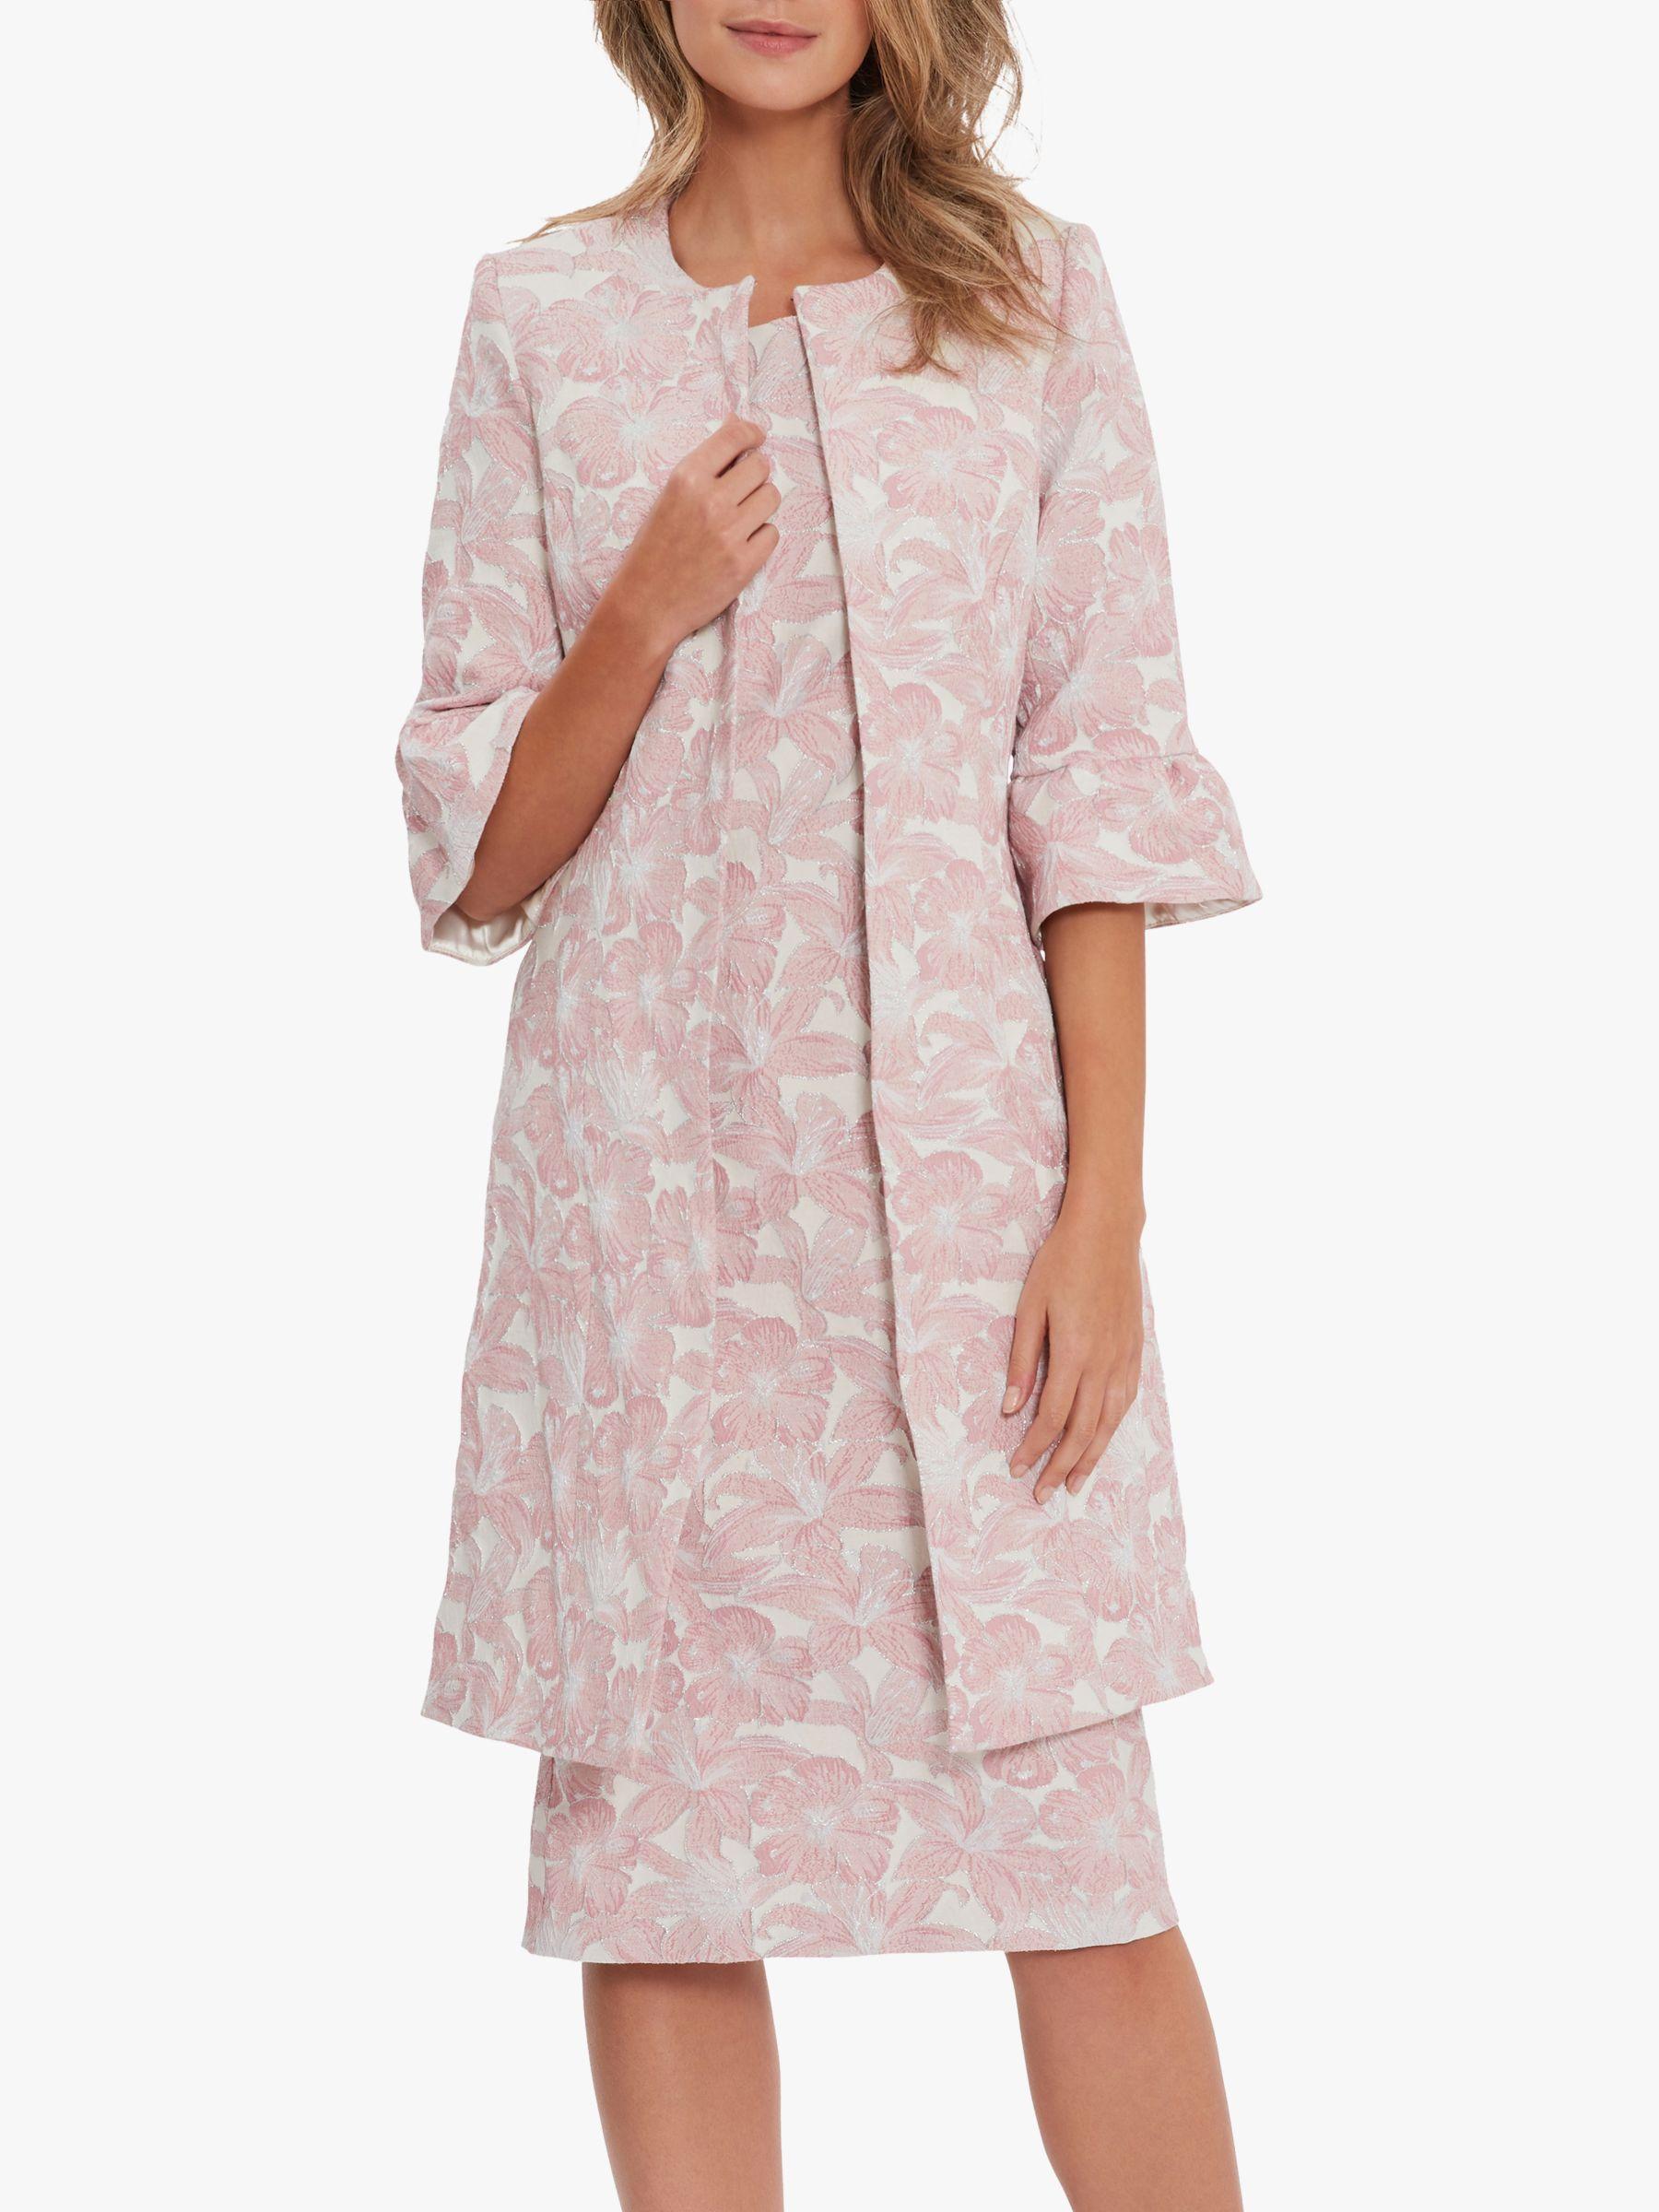 Gina Bacconi Gina Bacconi Greta Frill Cuff Jacquard Coat, Pink